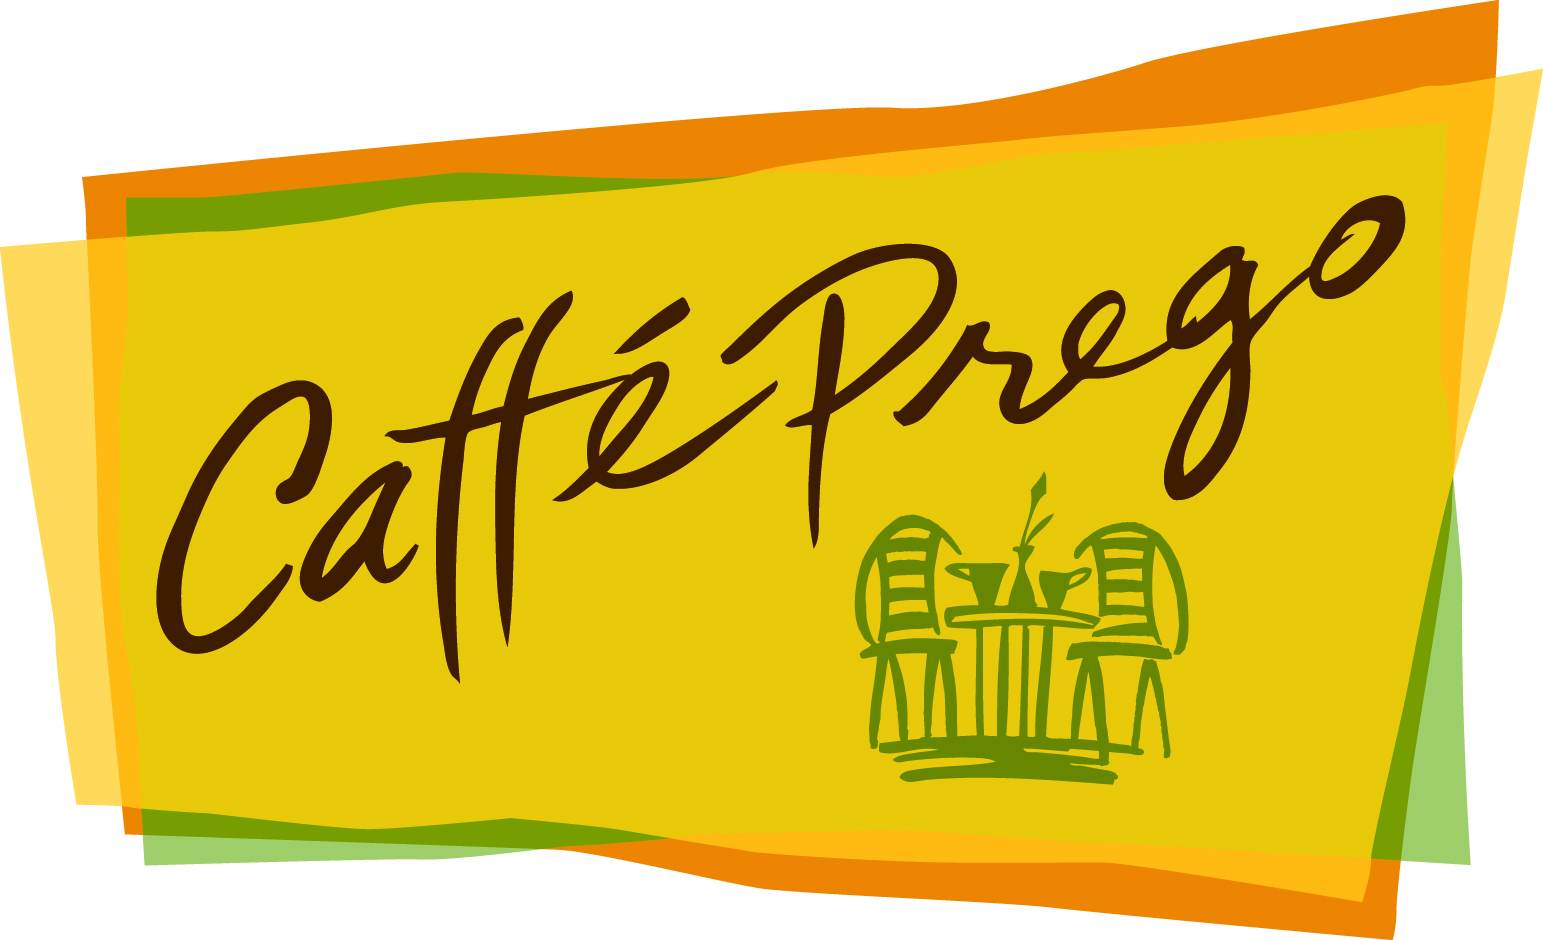 2018_Cafe-Prego_logo.jpg